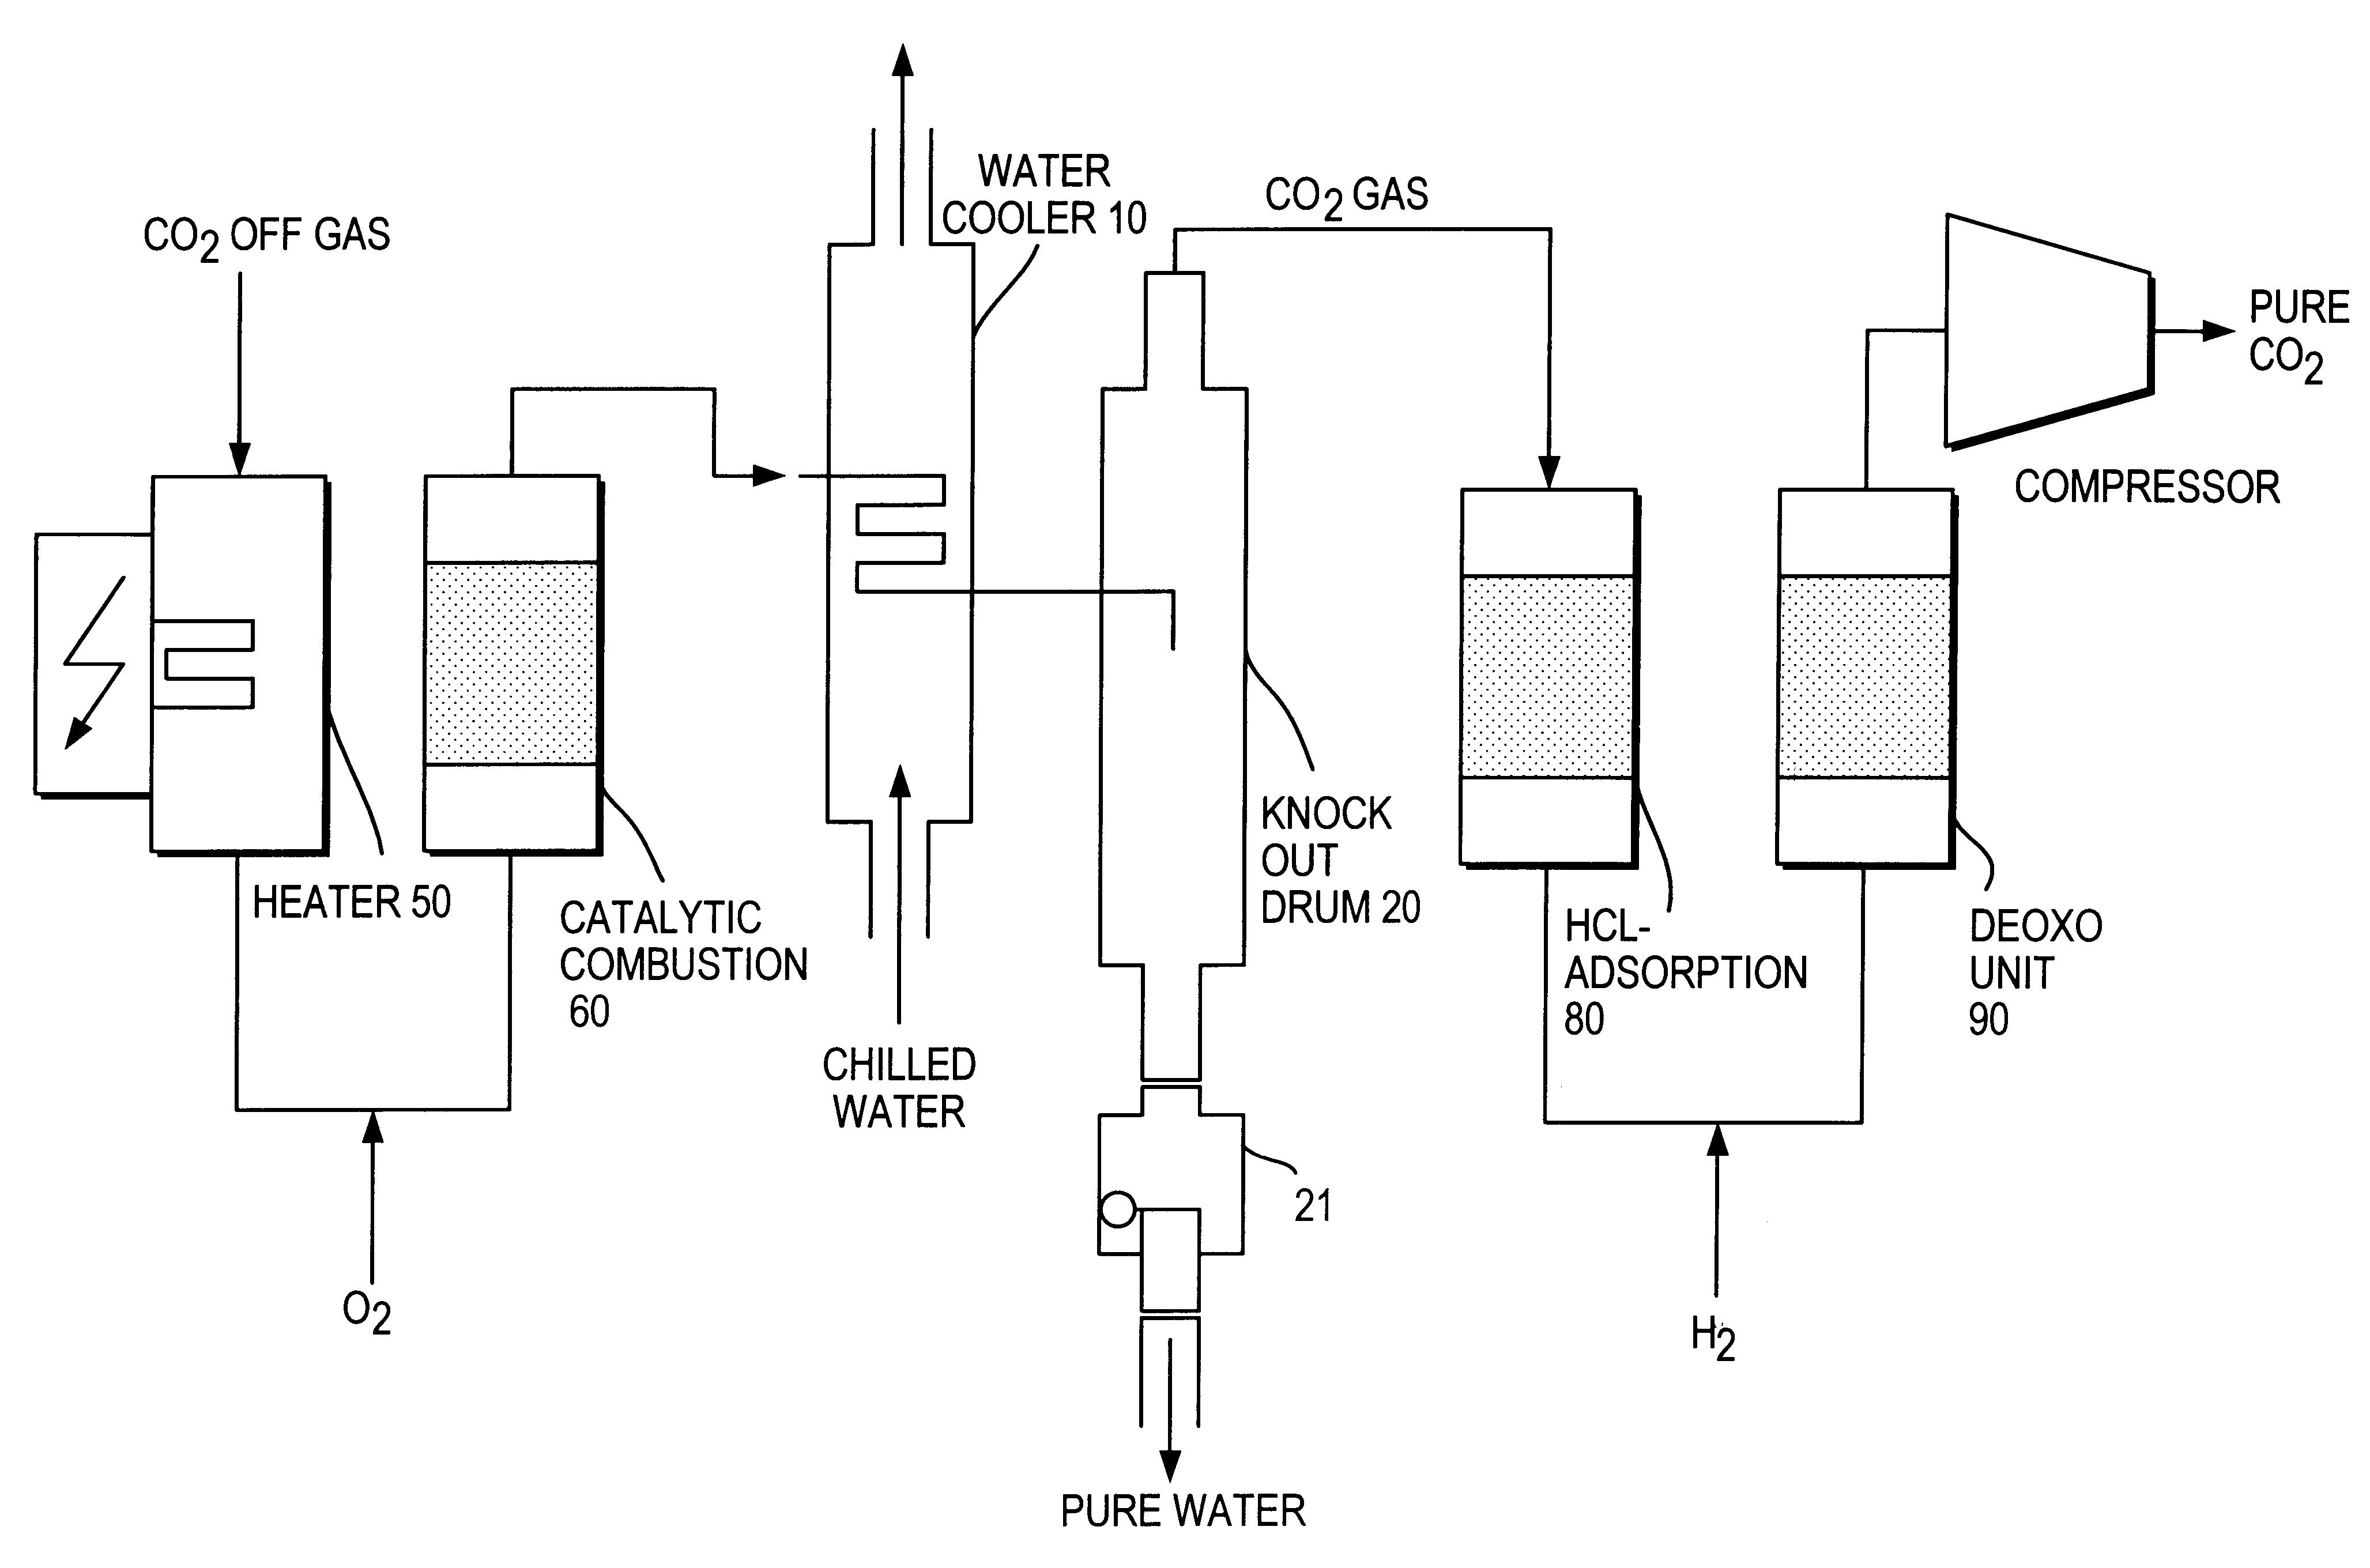 ethylene plant process flow diagram